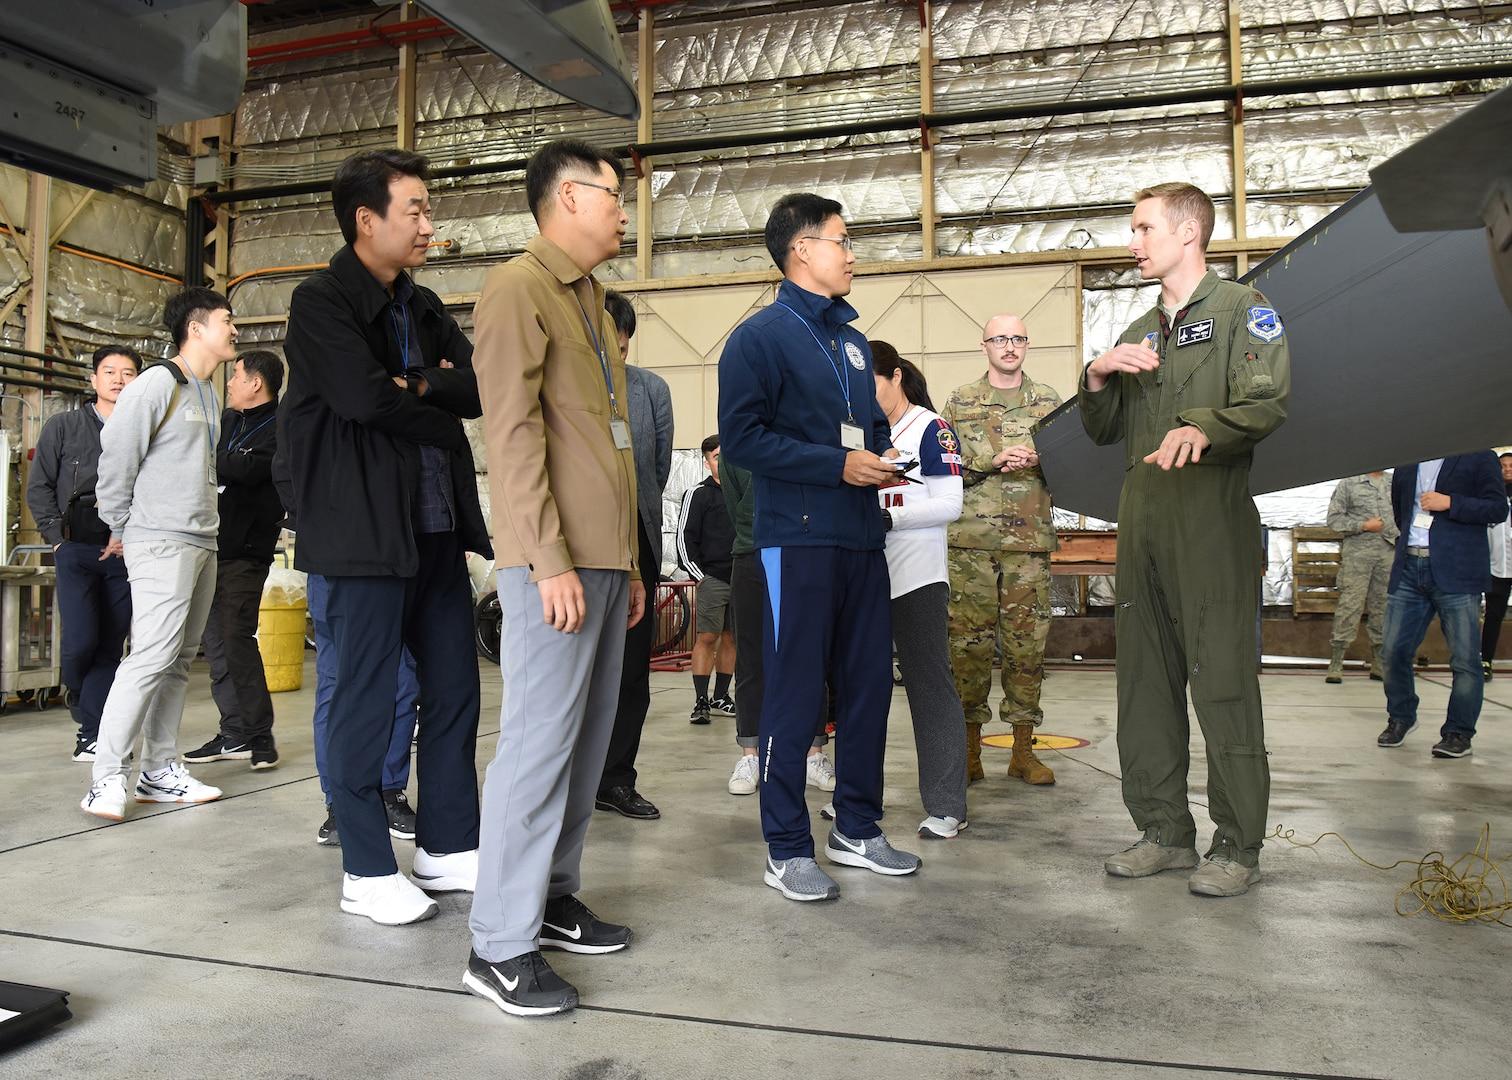 U.S. Air Force, Republic of Korea AF Legal Teams Celebrate Friendship Day